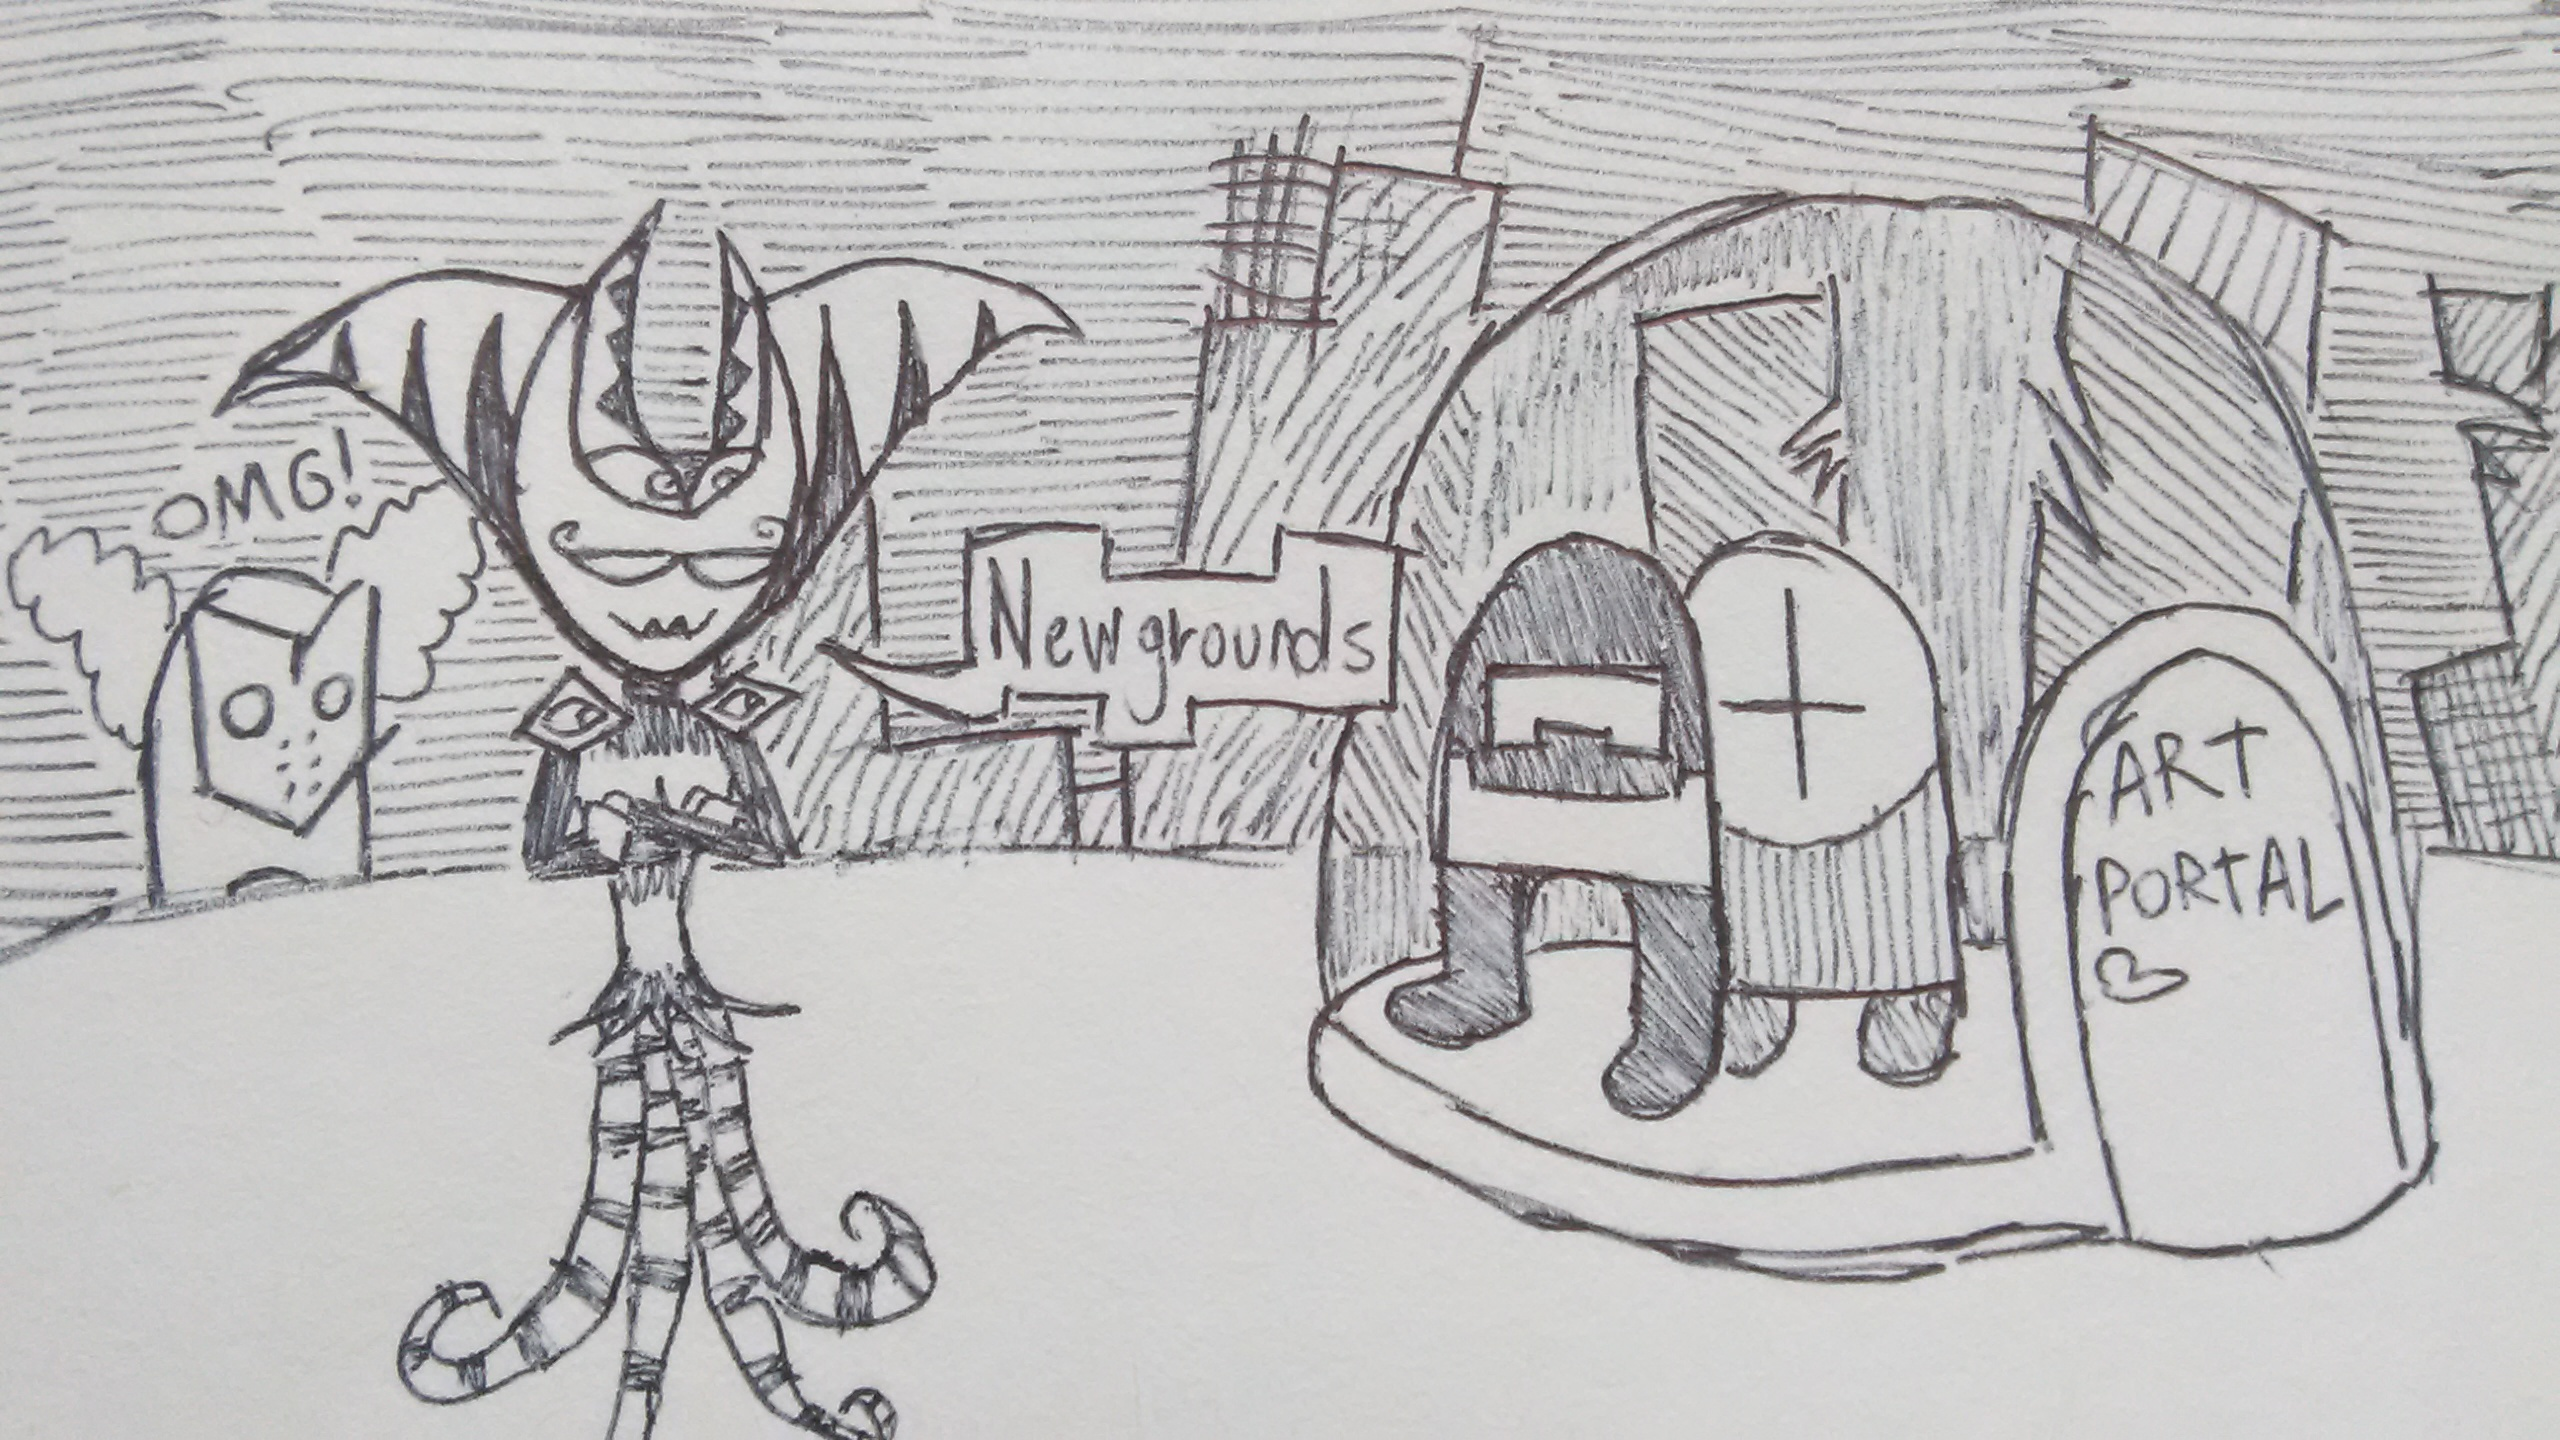 Newgroundsus